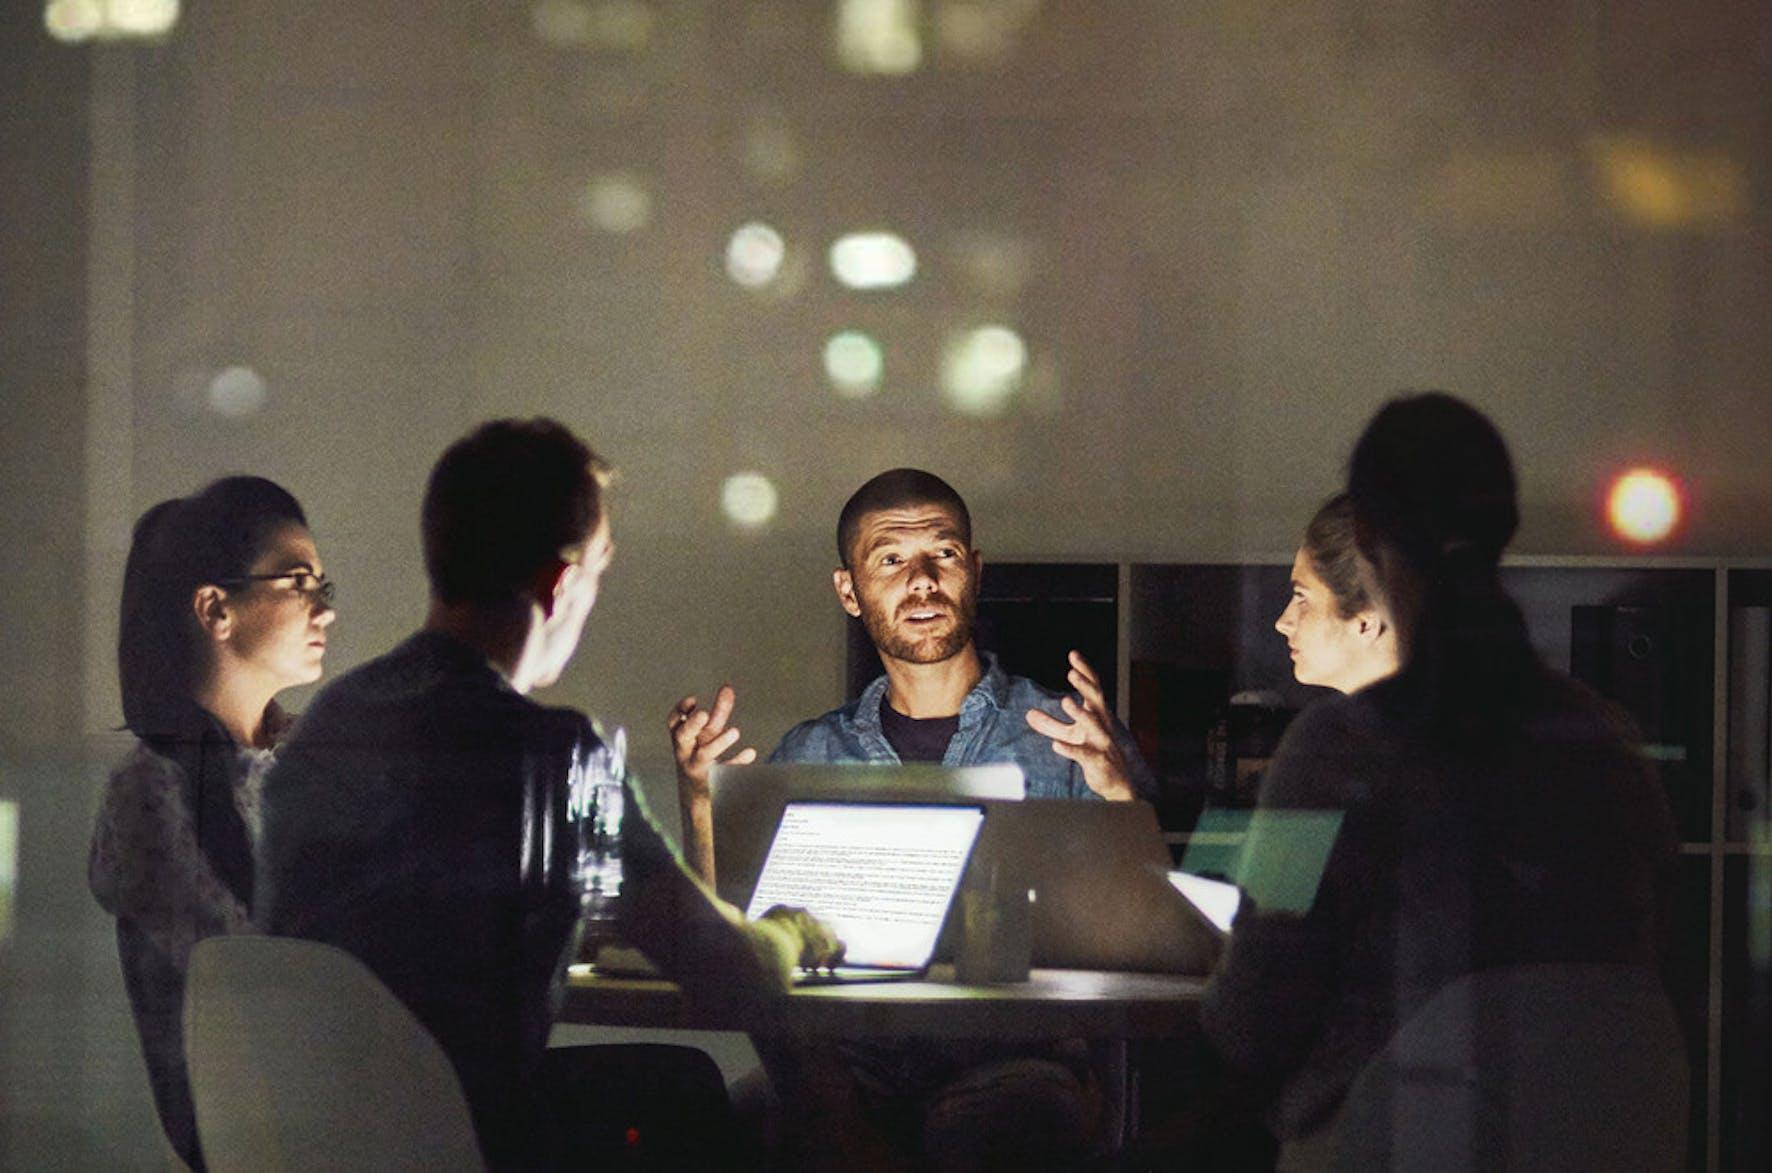 Team creating inspiring vision to start company.